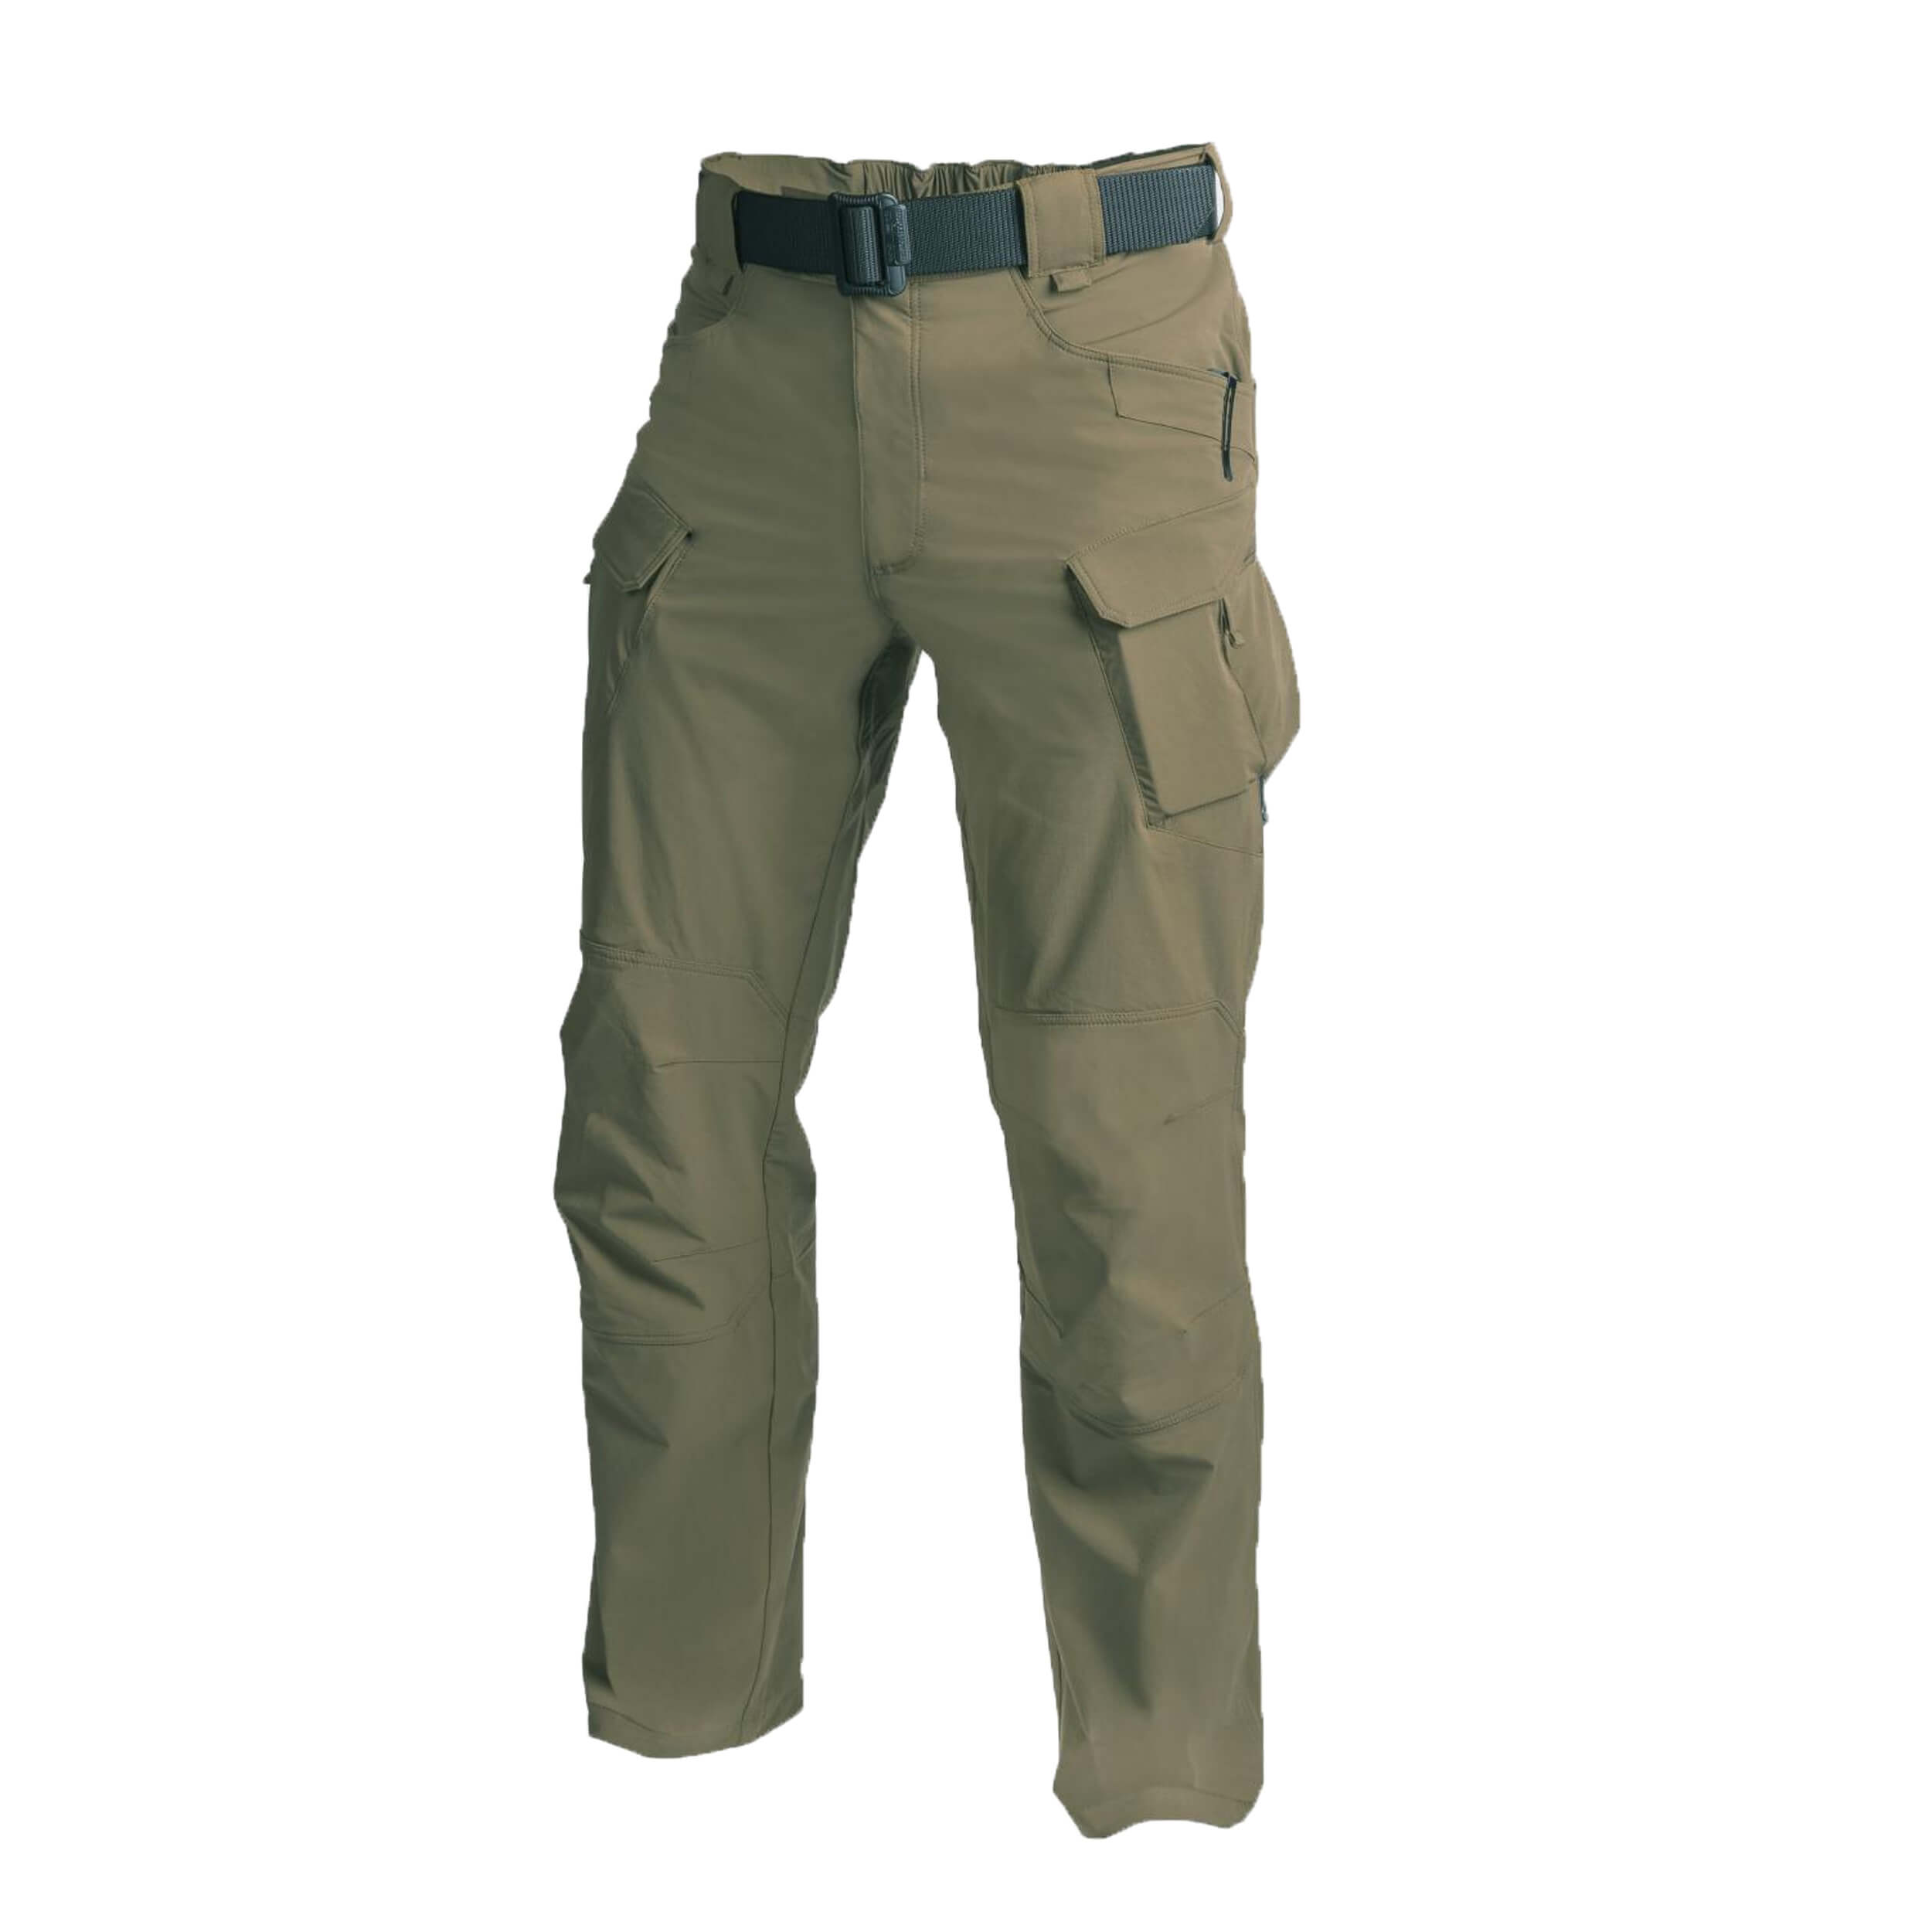 Helikon-Tex OTP Hose (Outdoor Tactical Pants) - VersaStretch - Adaptive Green